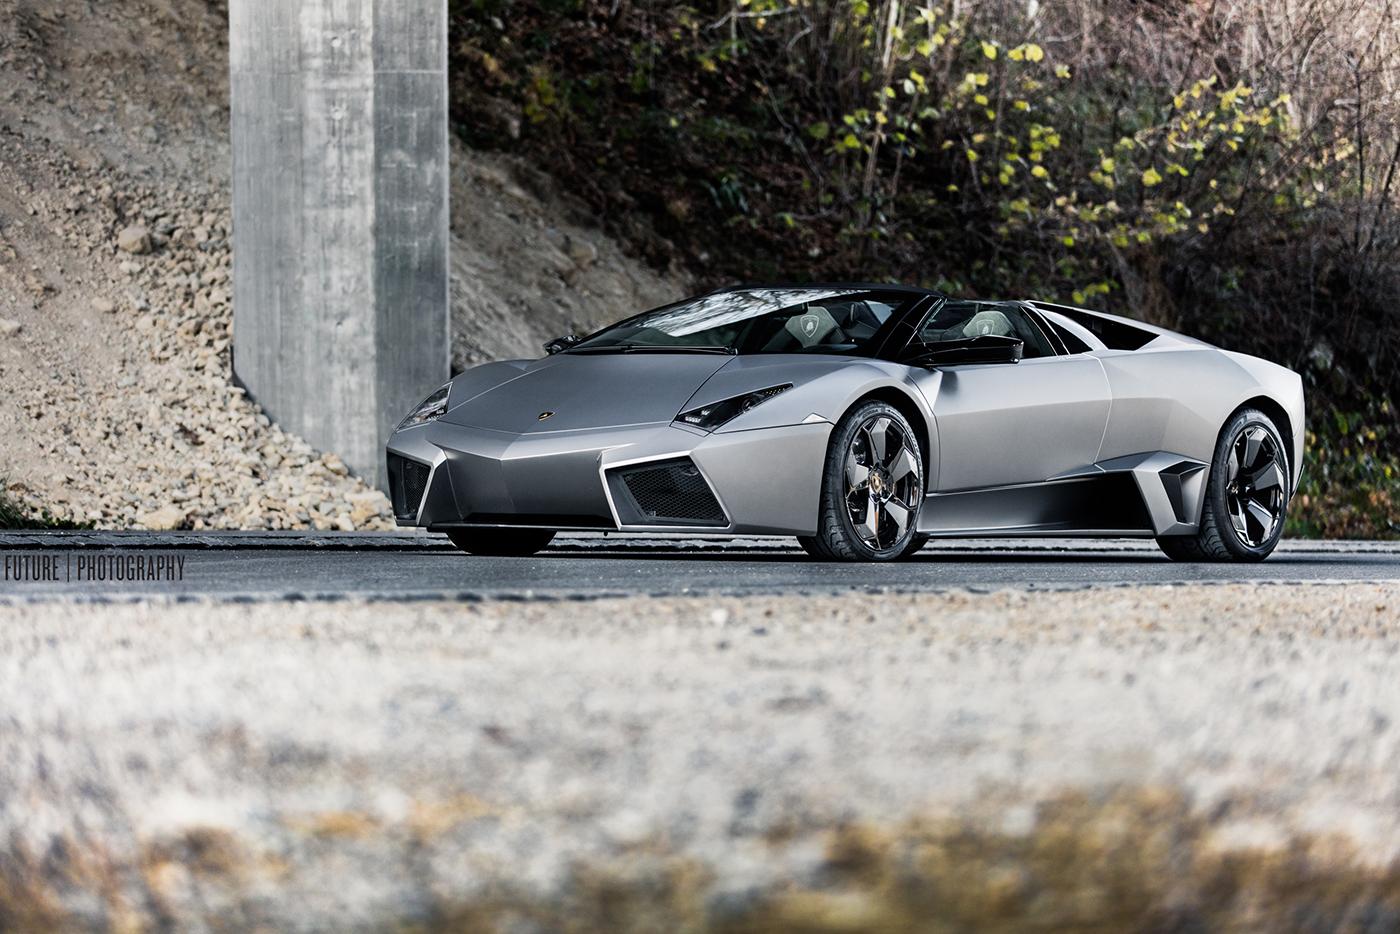 Photoshoot Lamborghini Revent 243 N Roadster Amp Mclaren Slr